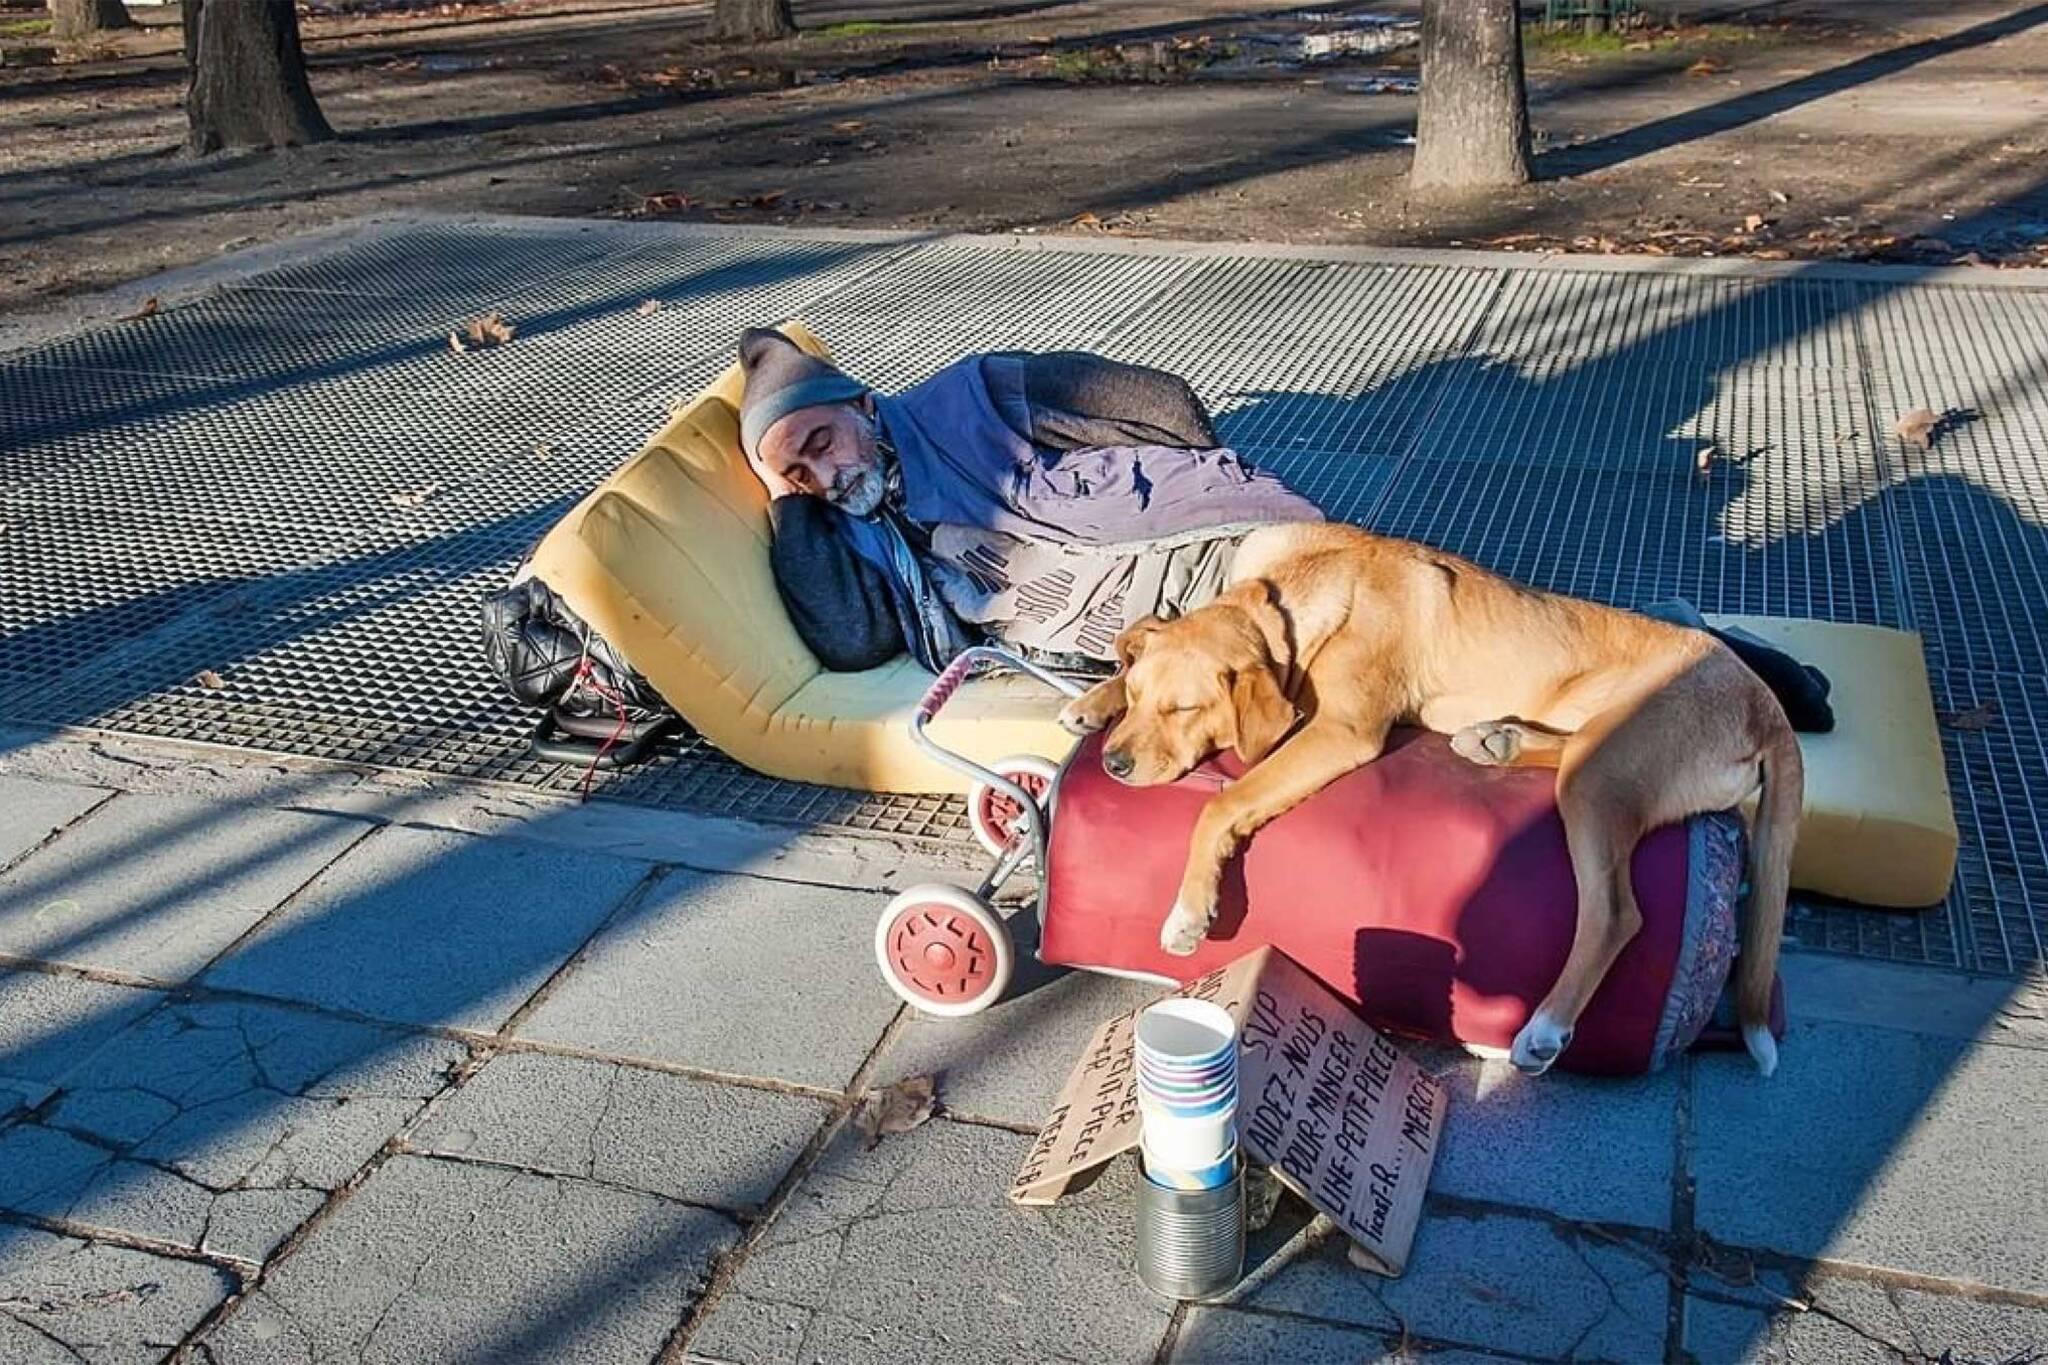 homeless covid 19